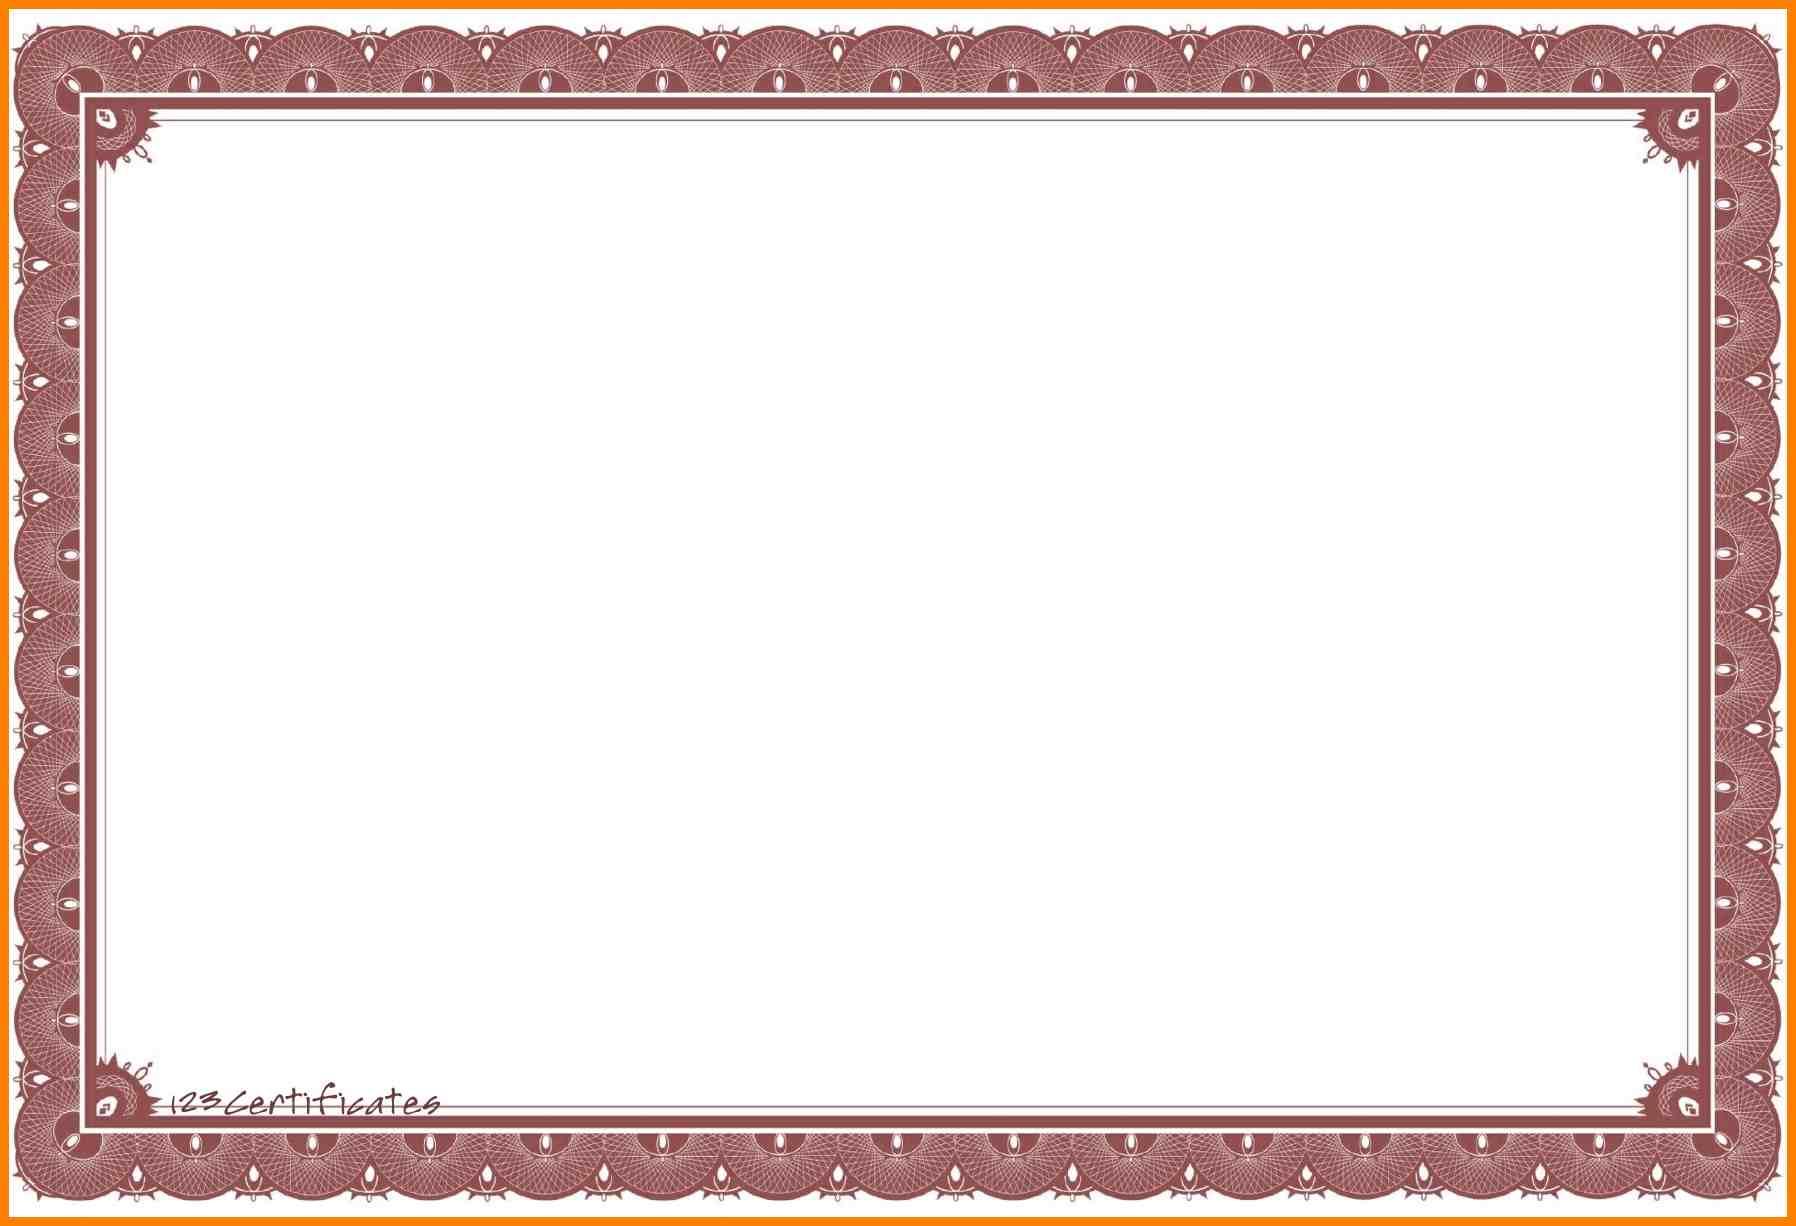 PNG Certificate Borders Free - 142018